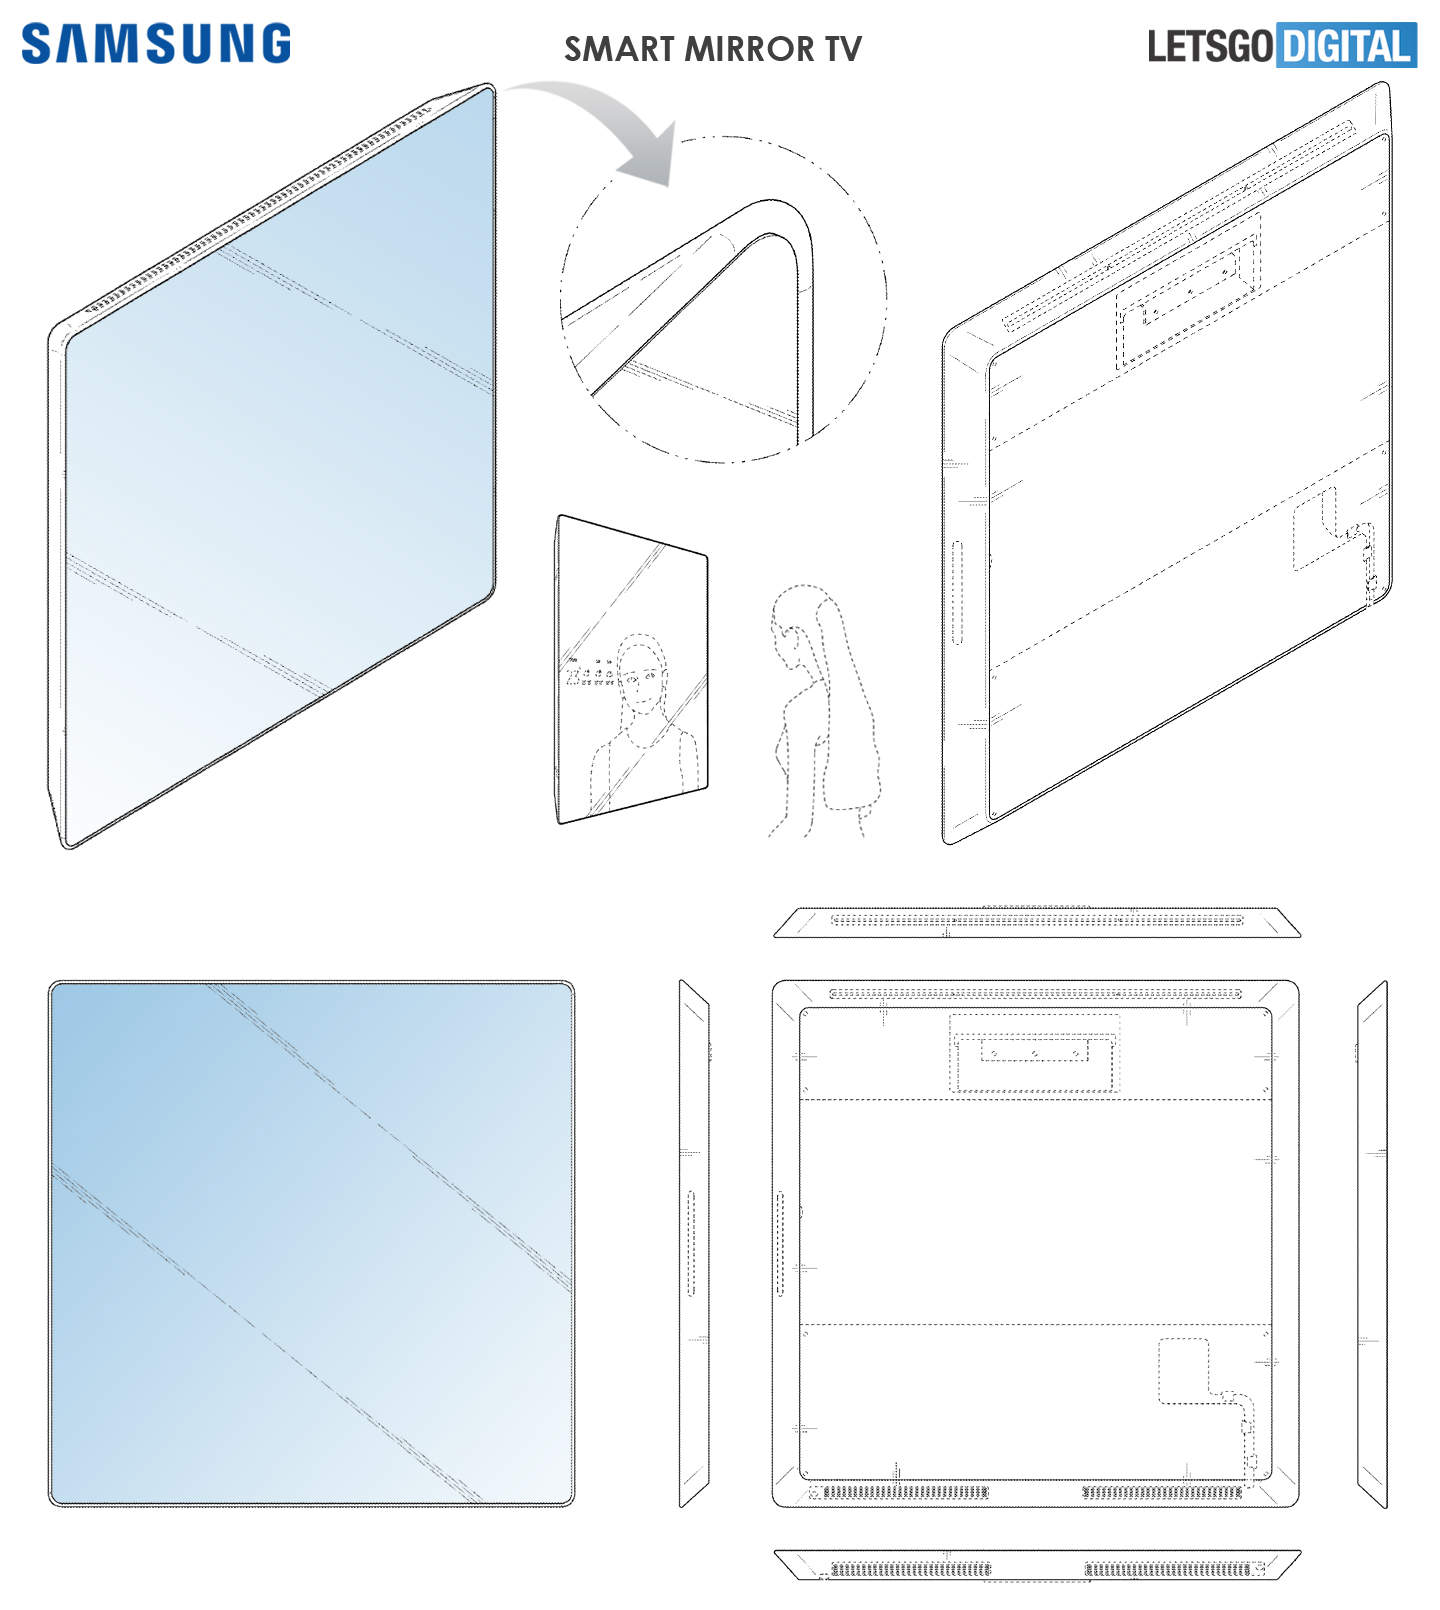 Smart Mirror TV